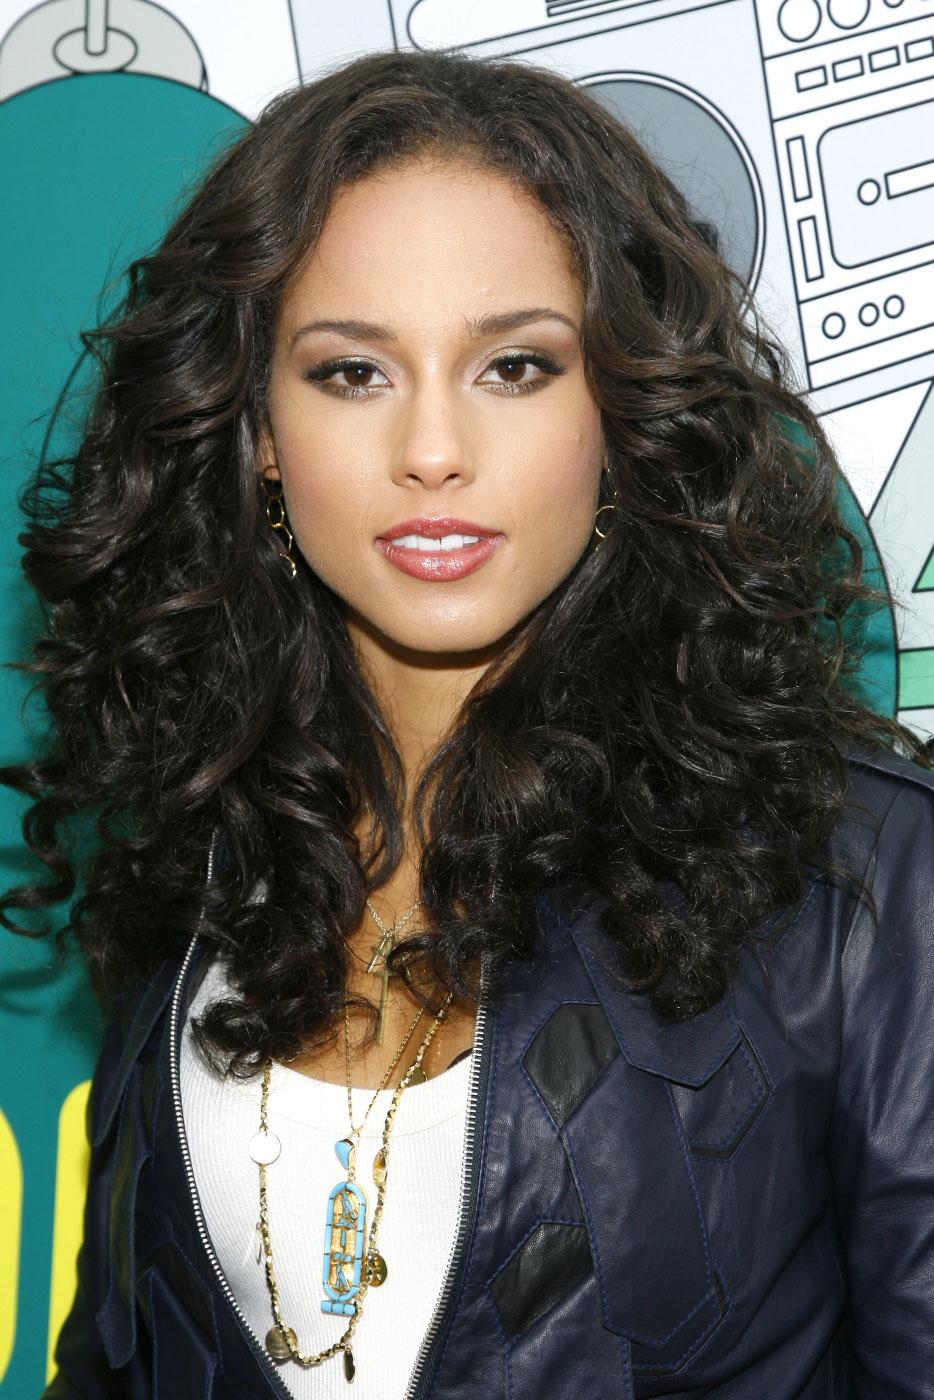 alicia keys - - hairstyle - easyhairstyler